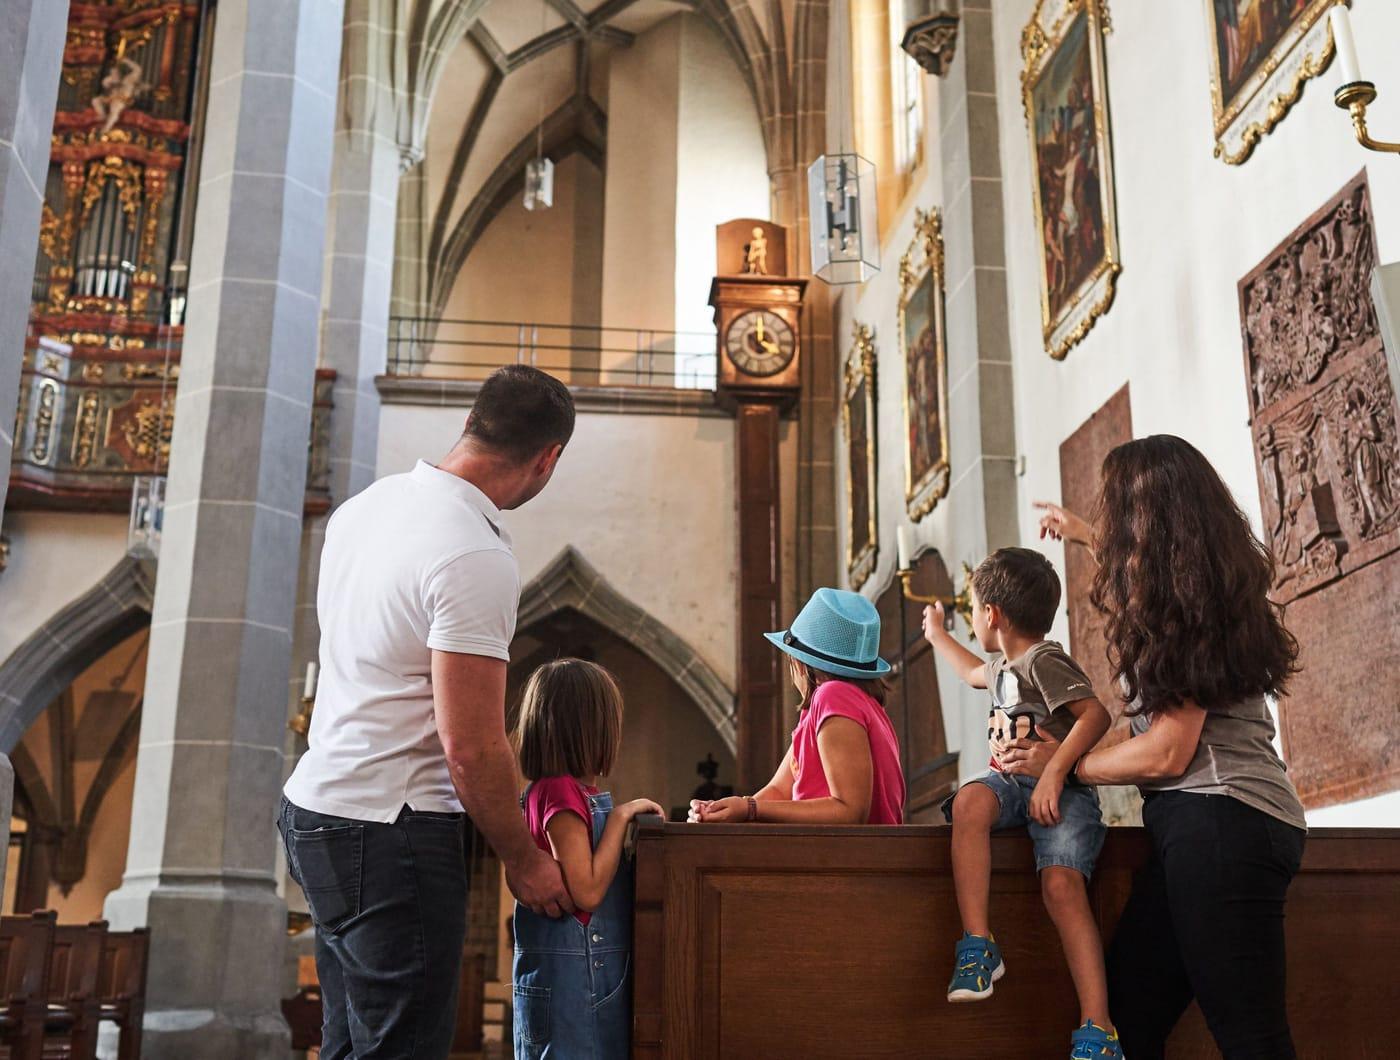 Familiensommer im Herzen Bayerns in Altötting // HIMBEER